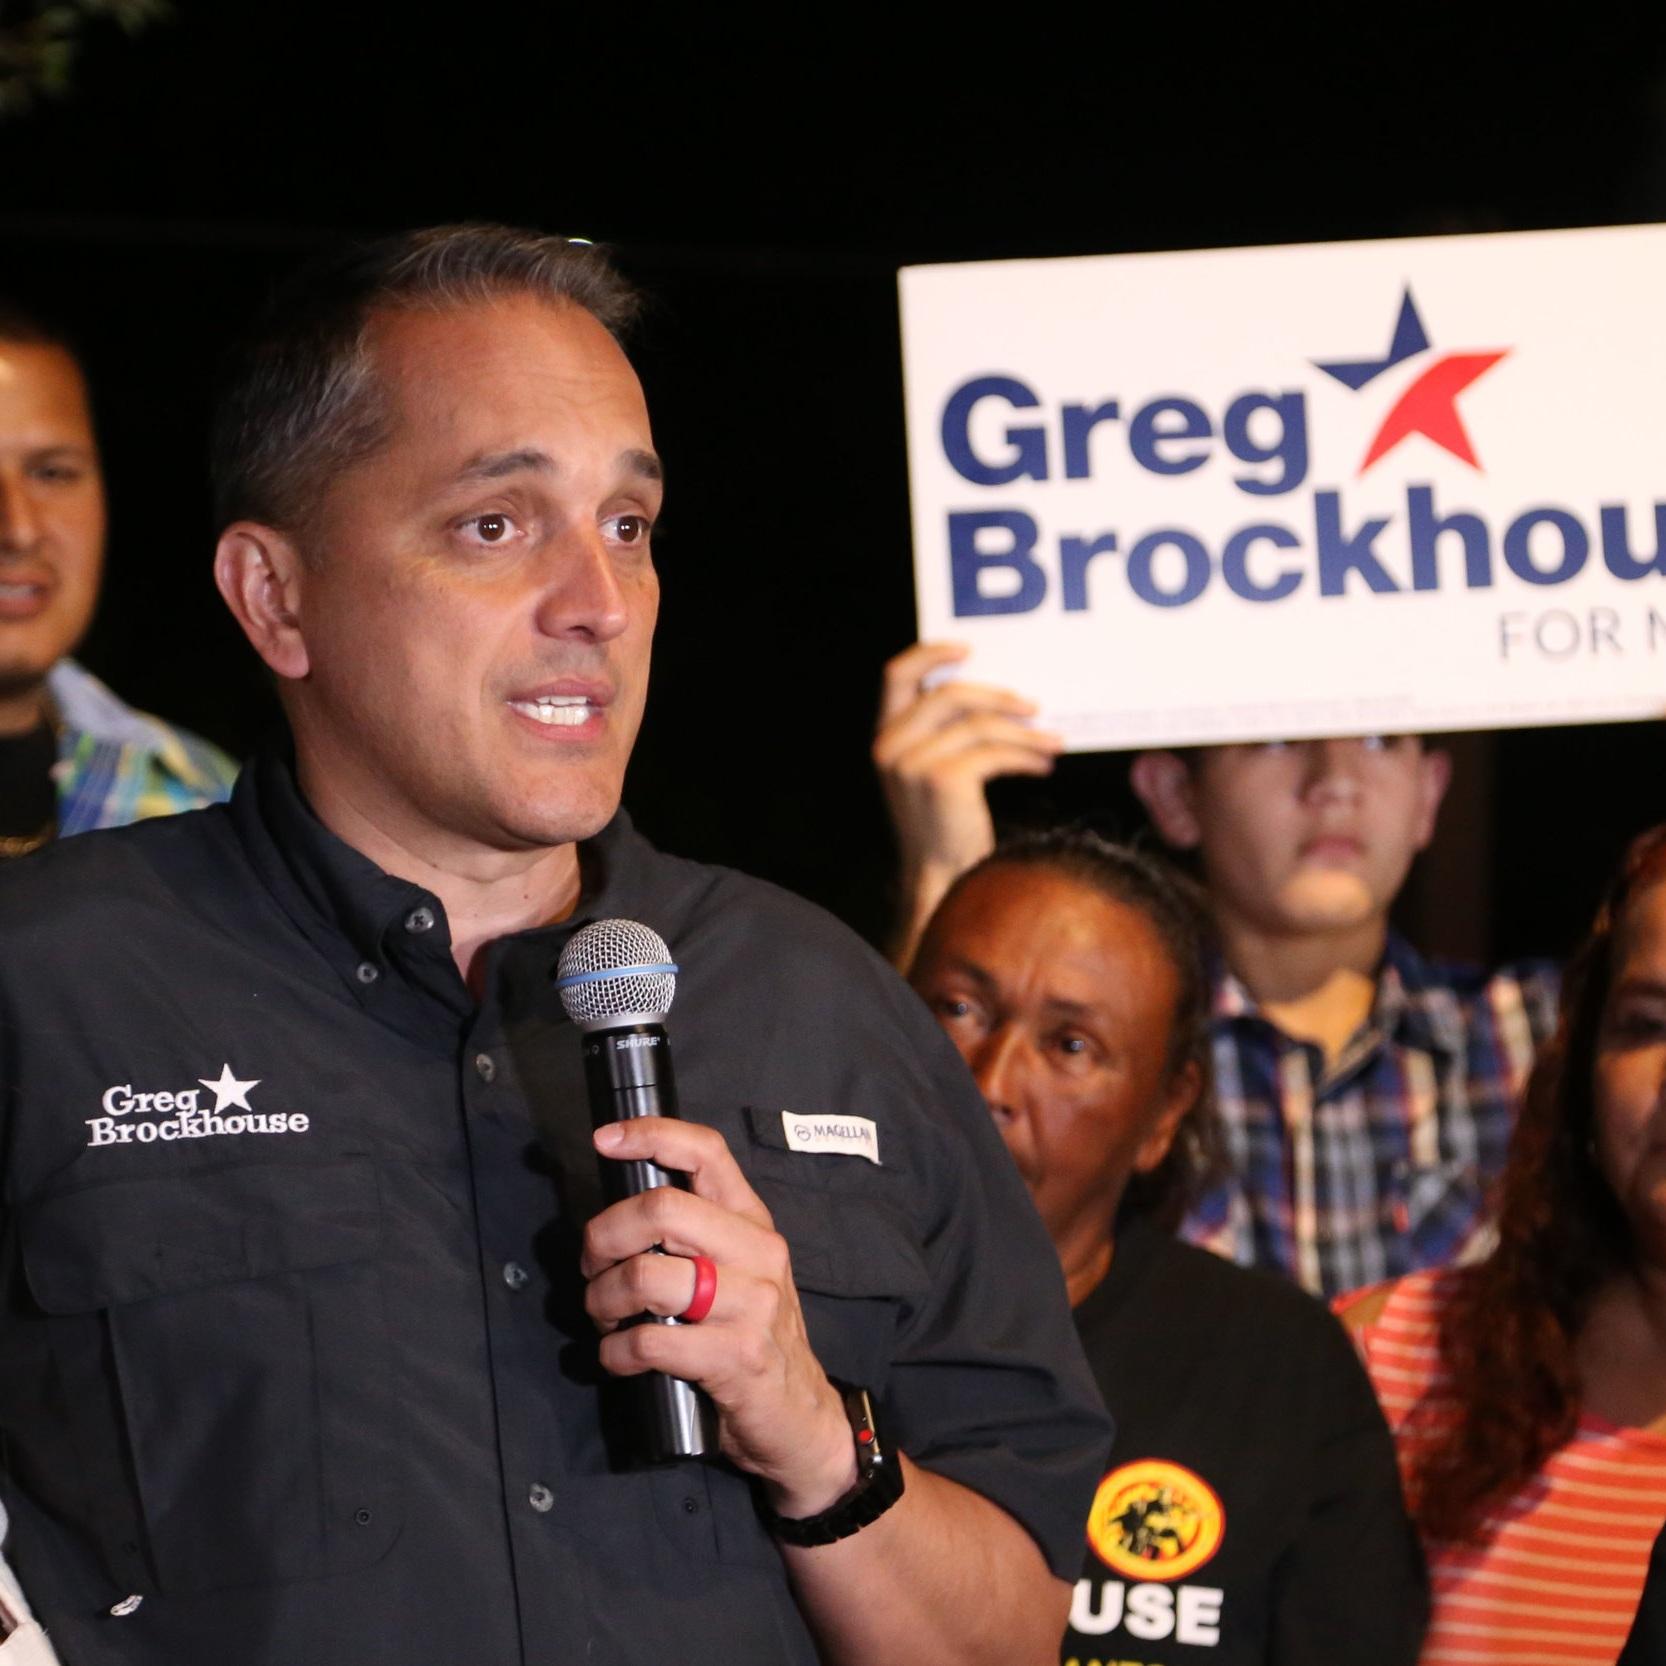 Greg Brockhouse